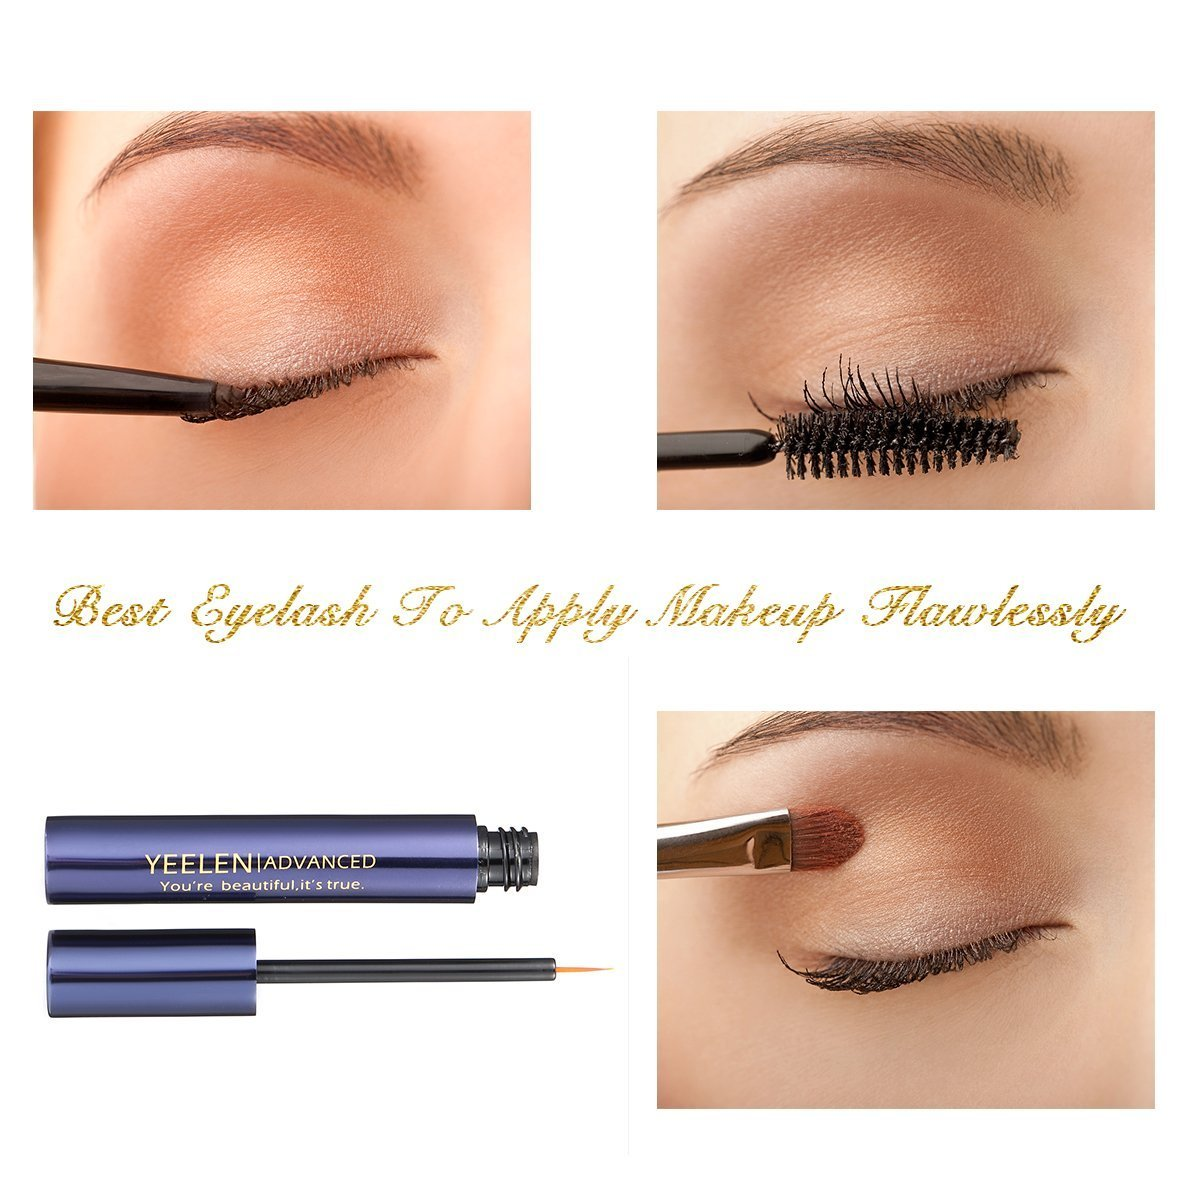 Yeelen Eyelash Eyebrow Growth Serum Grows Longer, Fuller, Thicker Lashes & Brows in 45 days! Enhancer Eyelash Conditioner Non-prescription Eyelash Serum 5ml by Yeelen (Image #6)